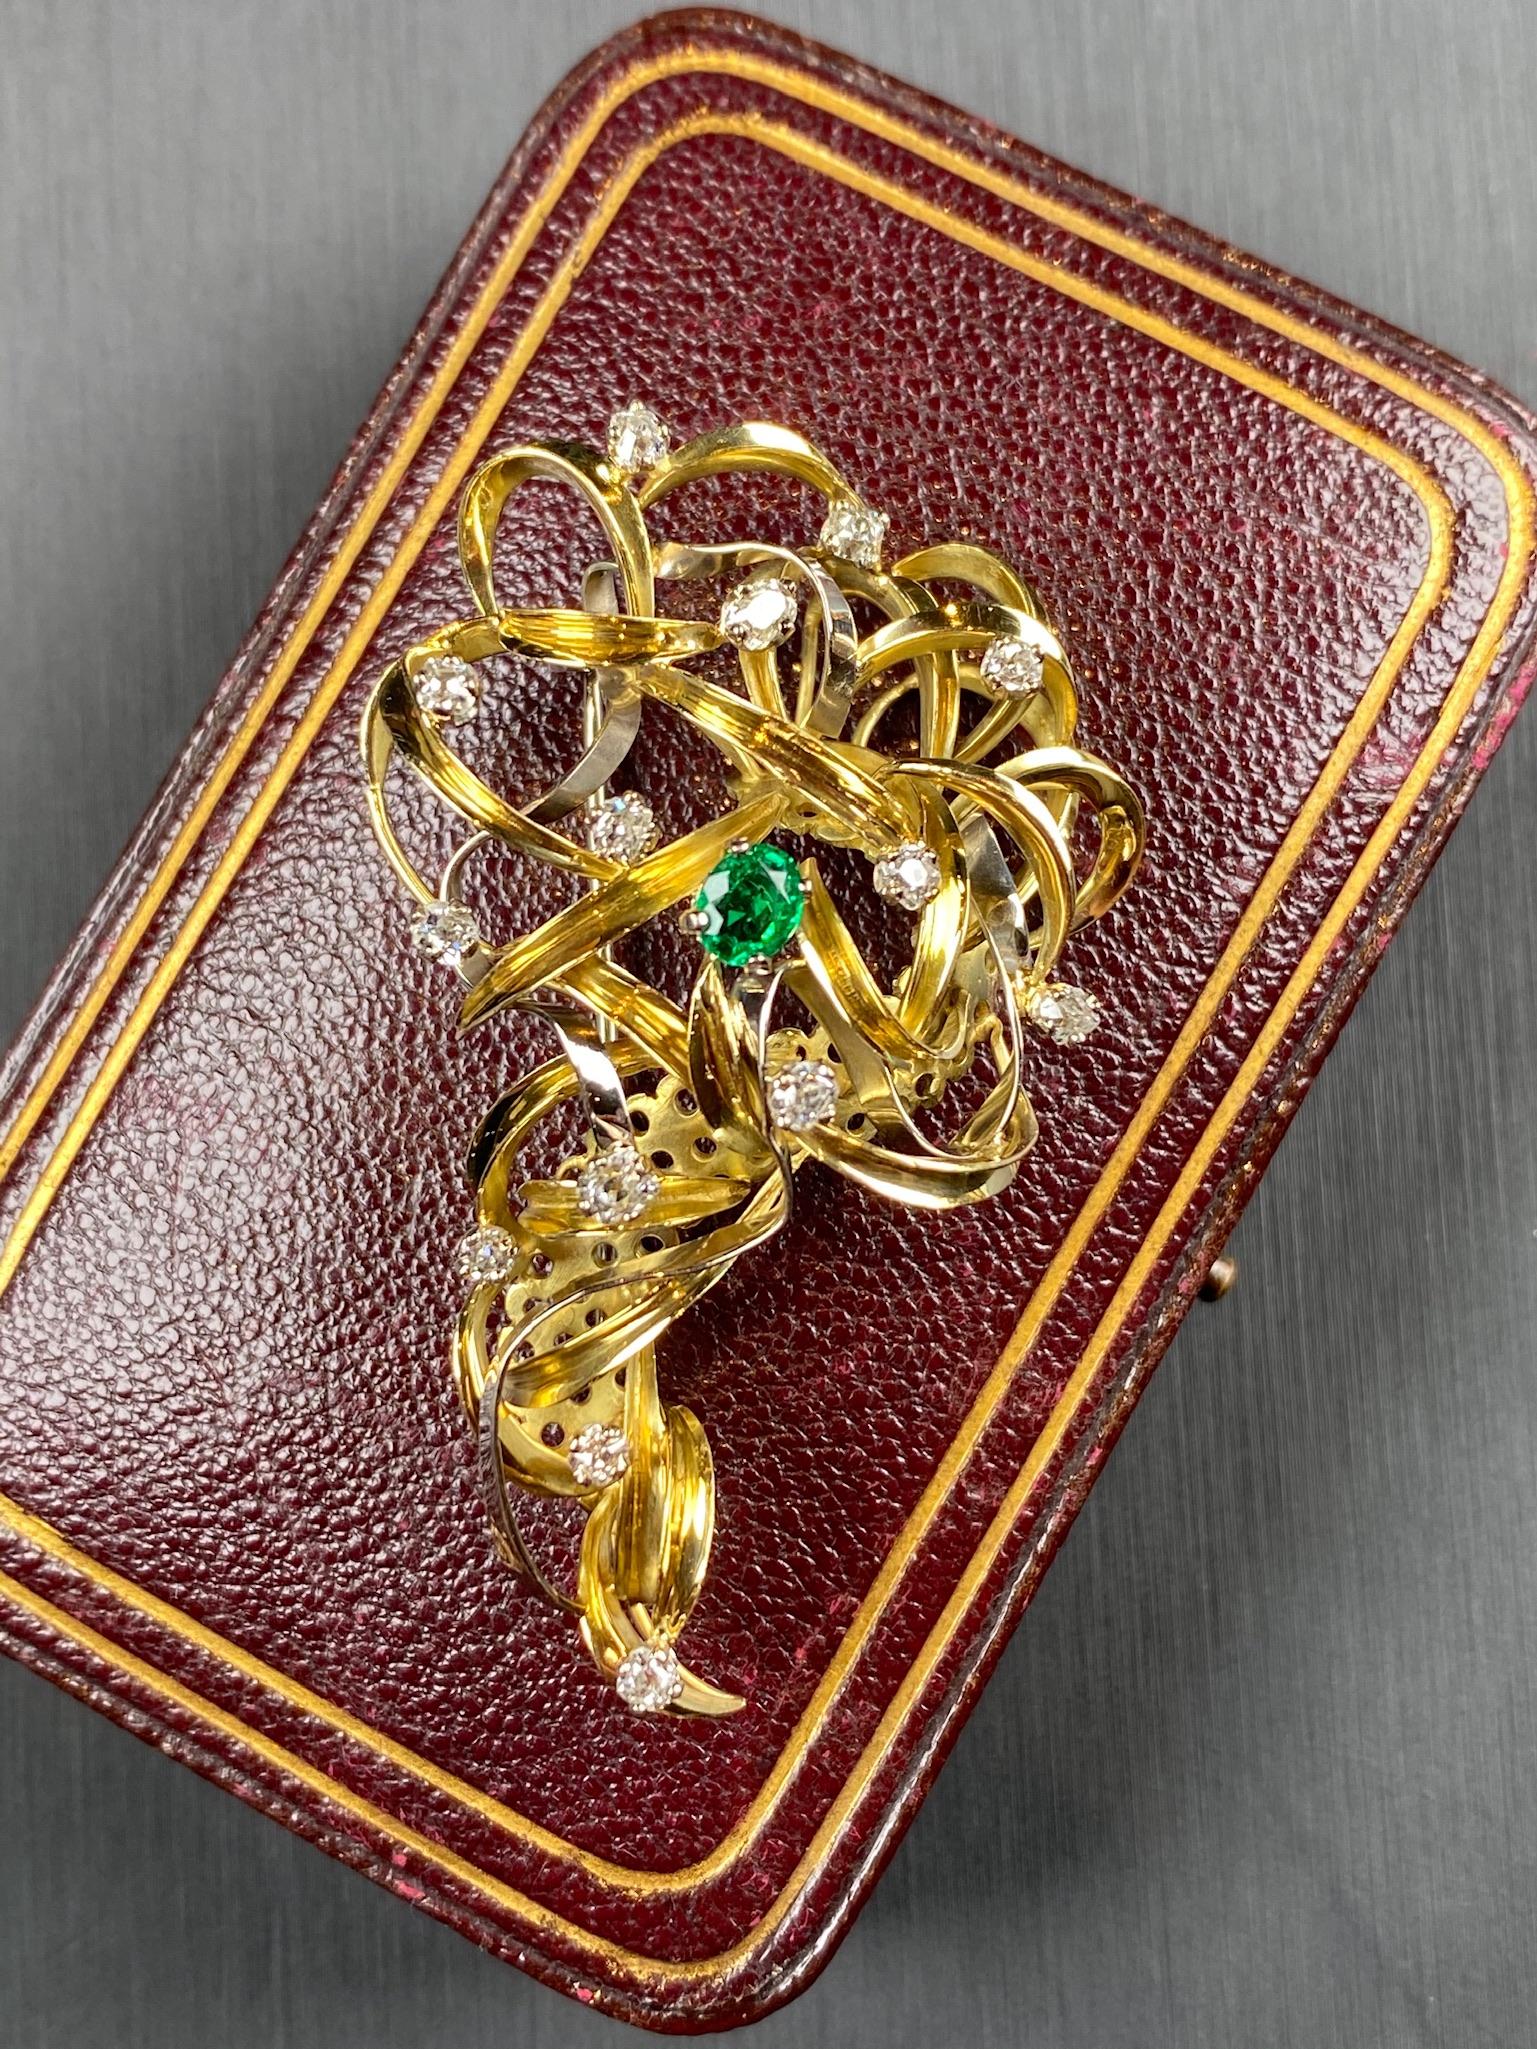 Emerald and Diamond Brooch - Image 2 of 6